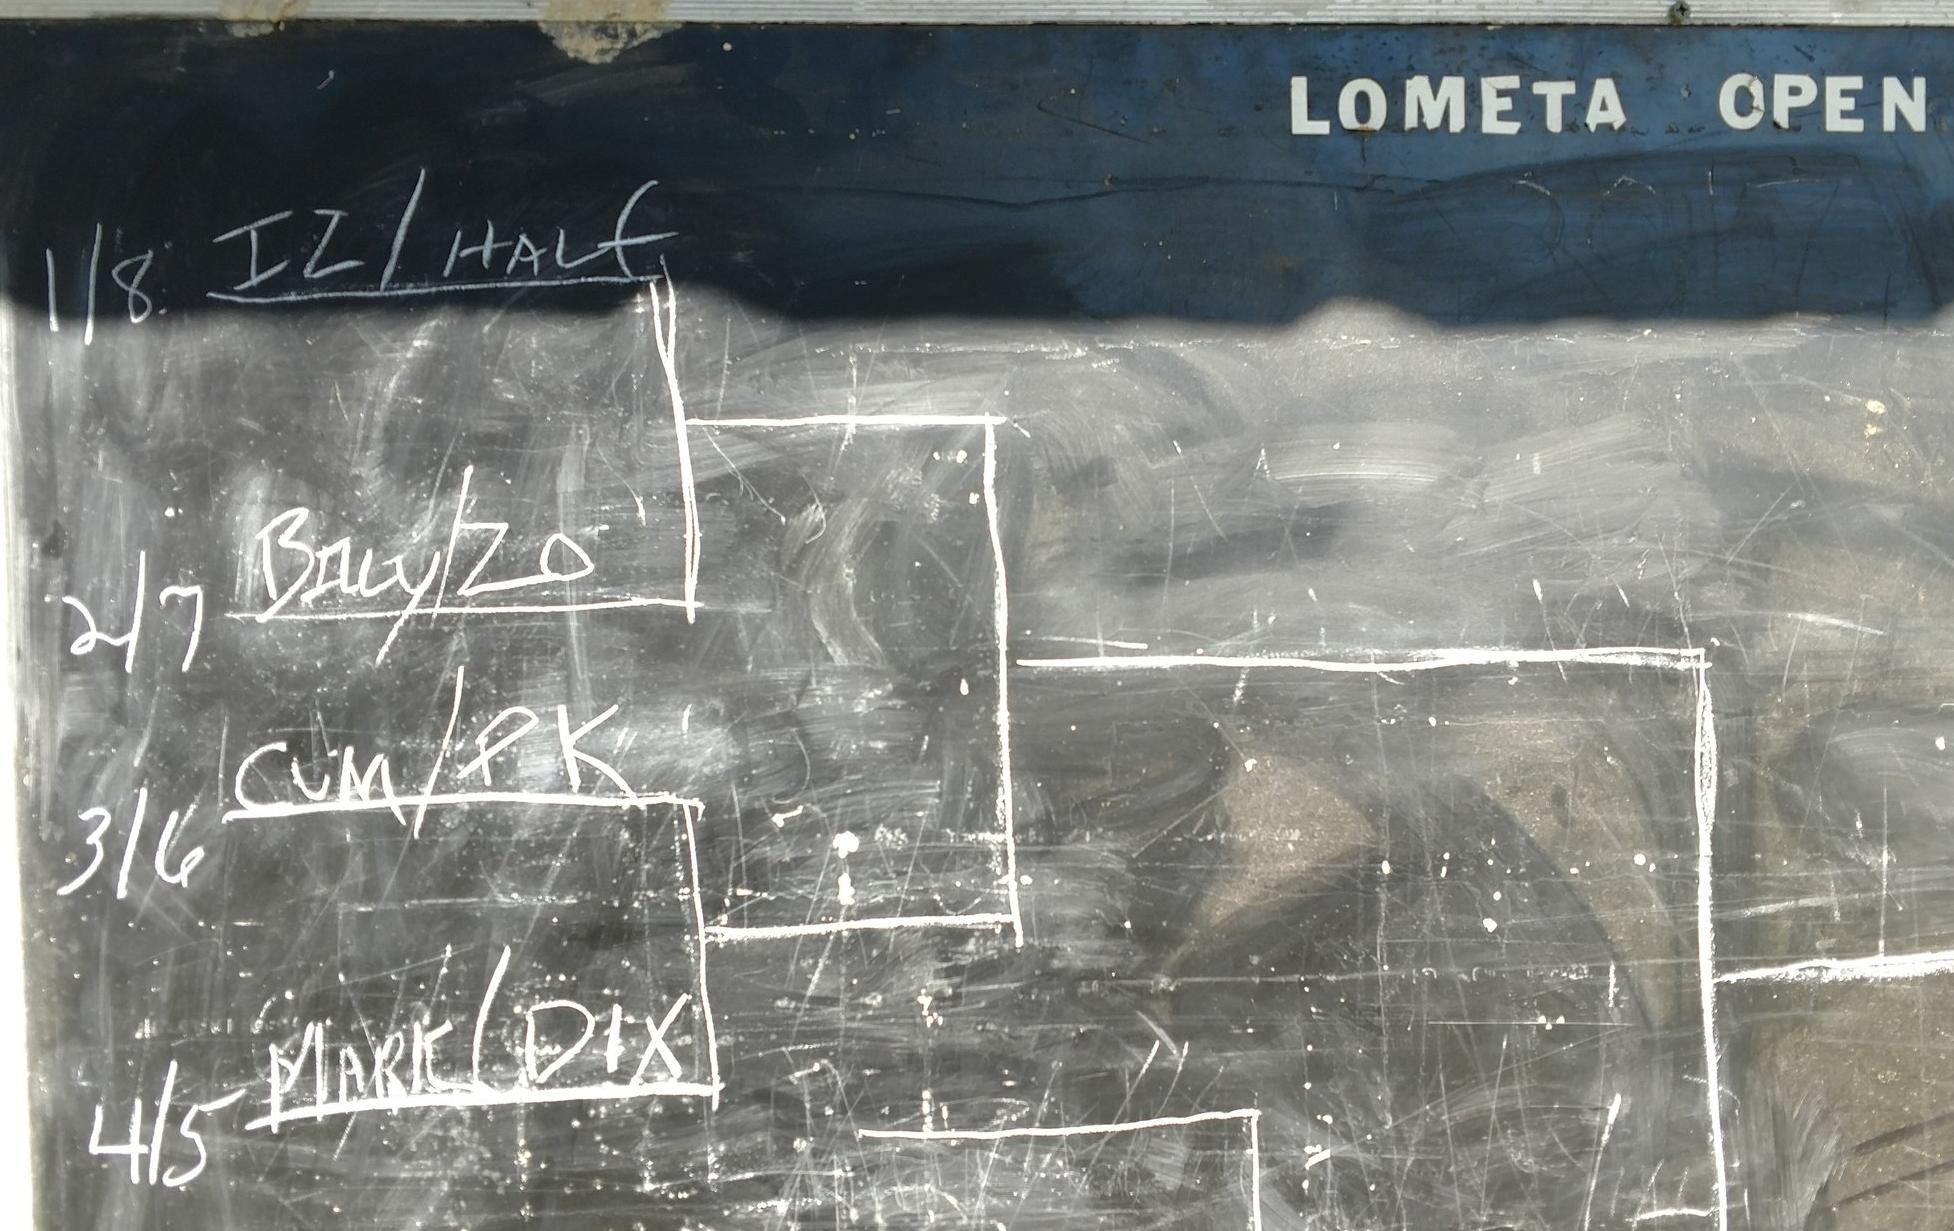 Lometa Open Horseshoe National Championship double elimination tournament